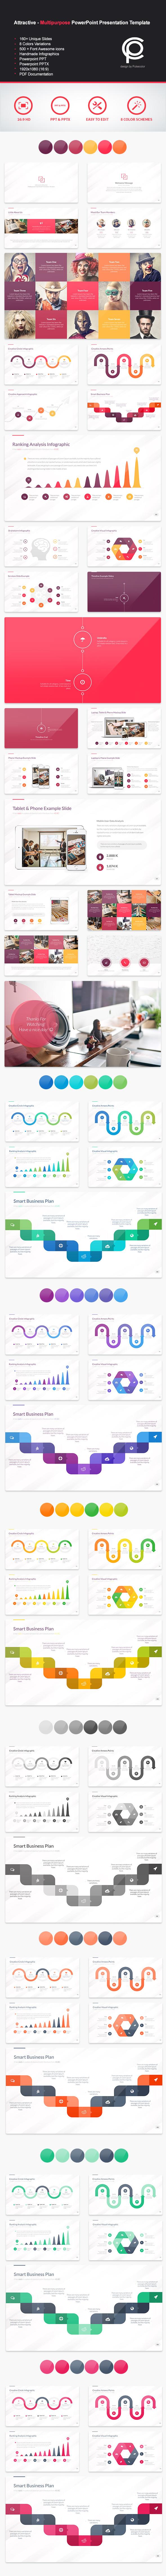 GraphicRiver Attractive Multipurpose PowerPoint Presentation 11778342